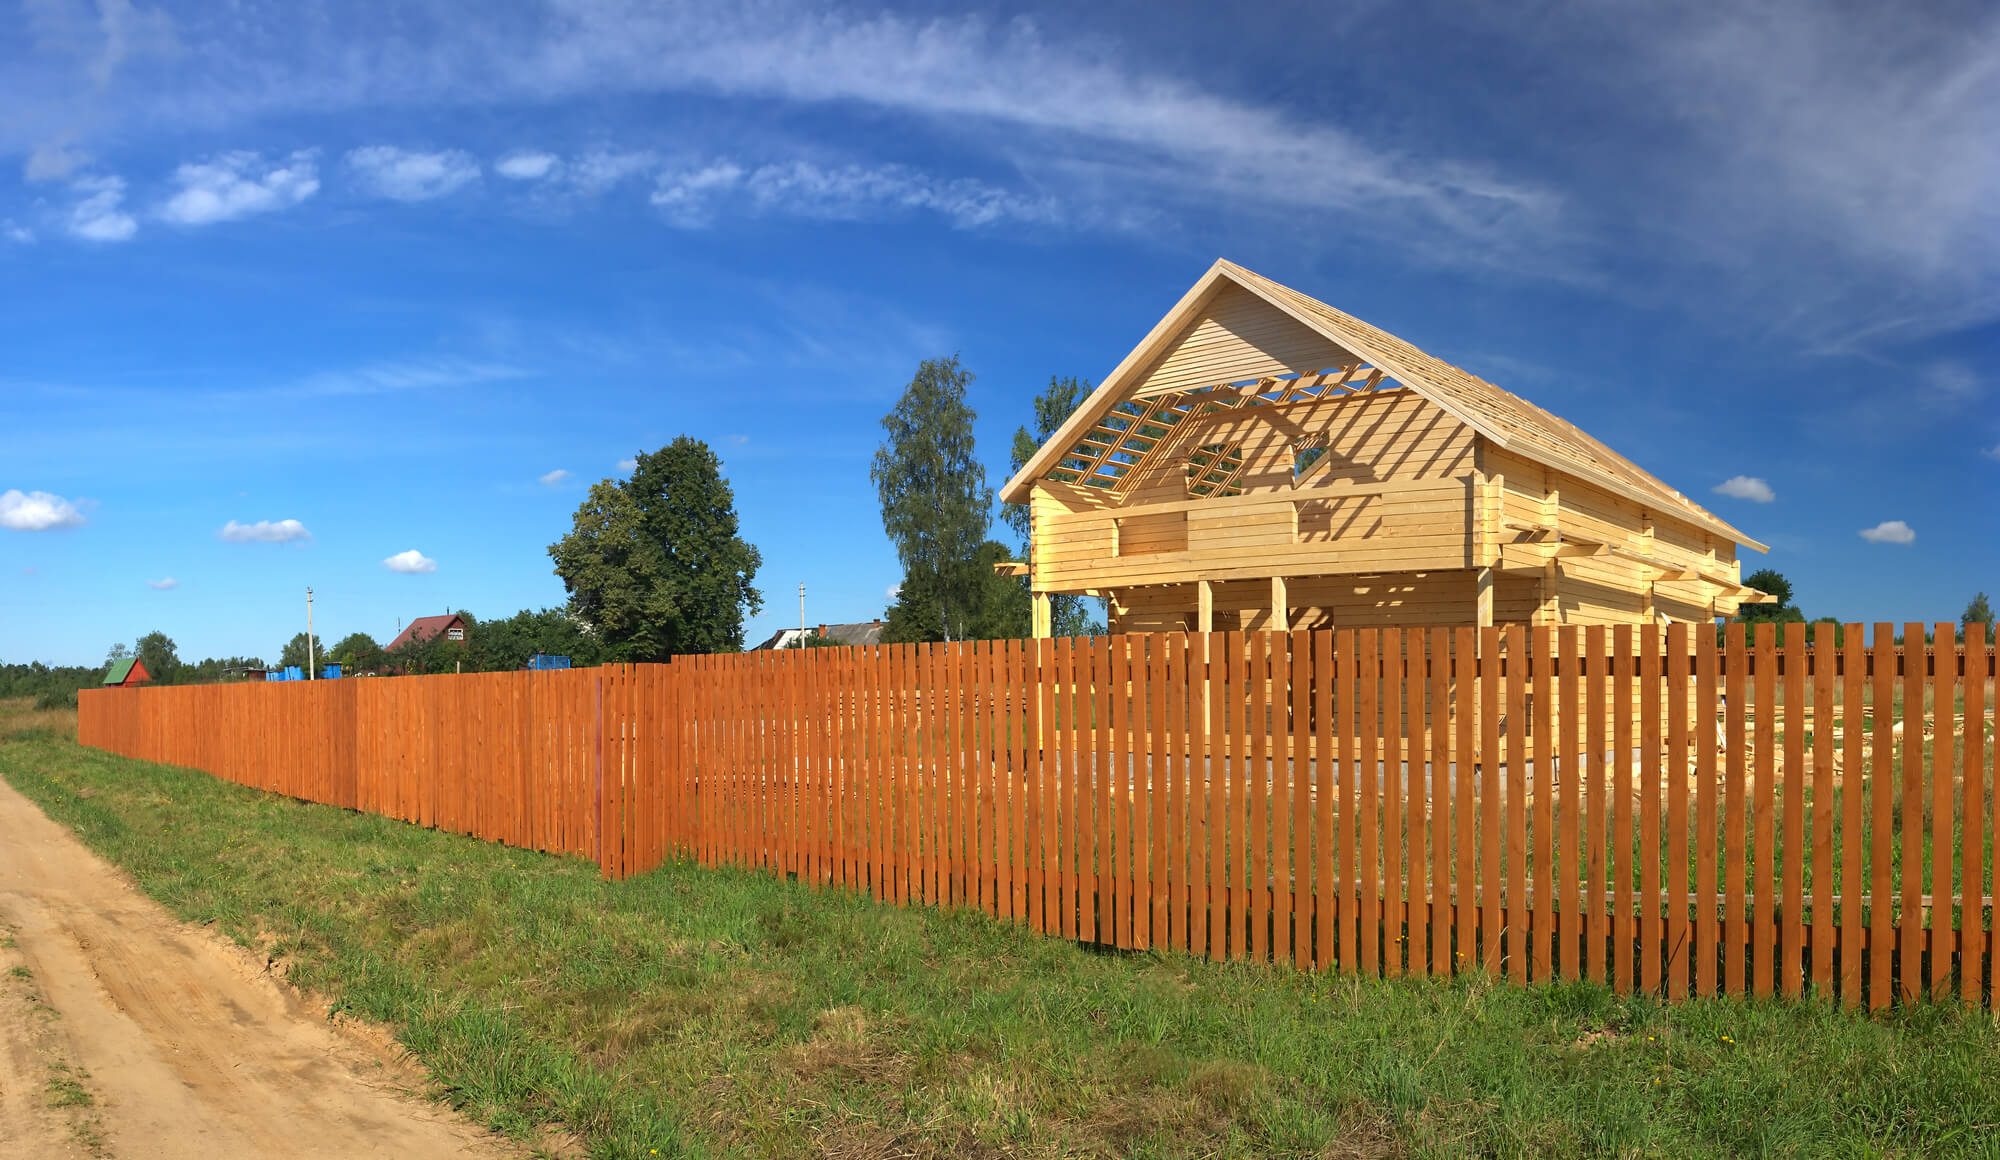 Big Easy Fences - Wooden Fence